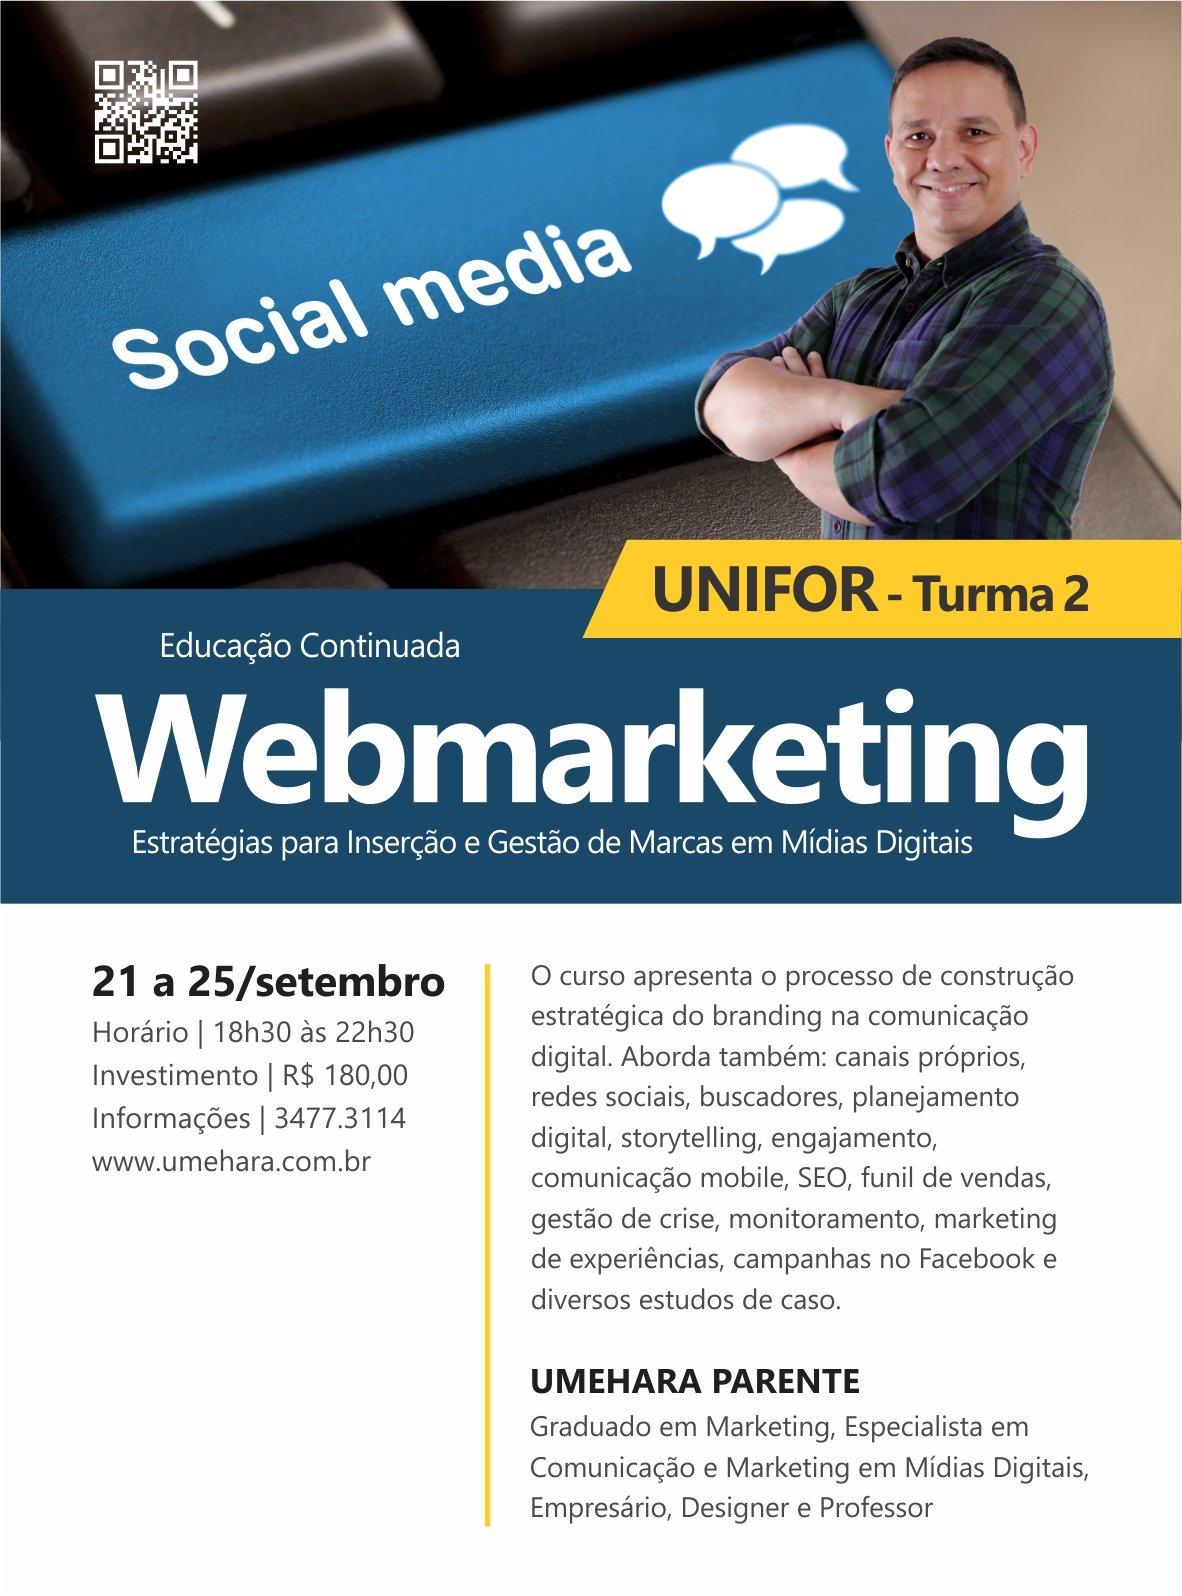 Webmarketing - Email